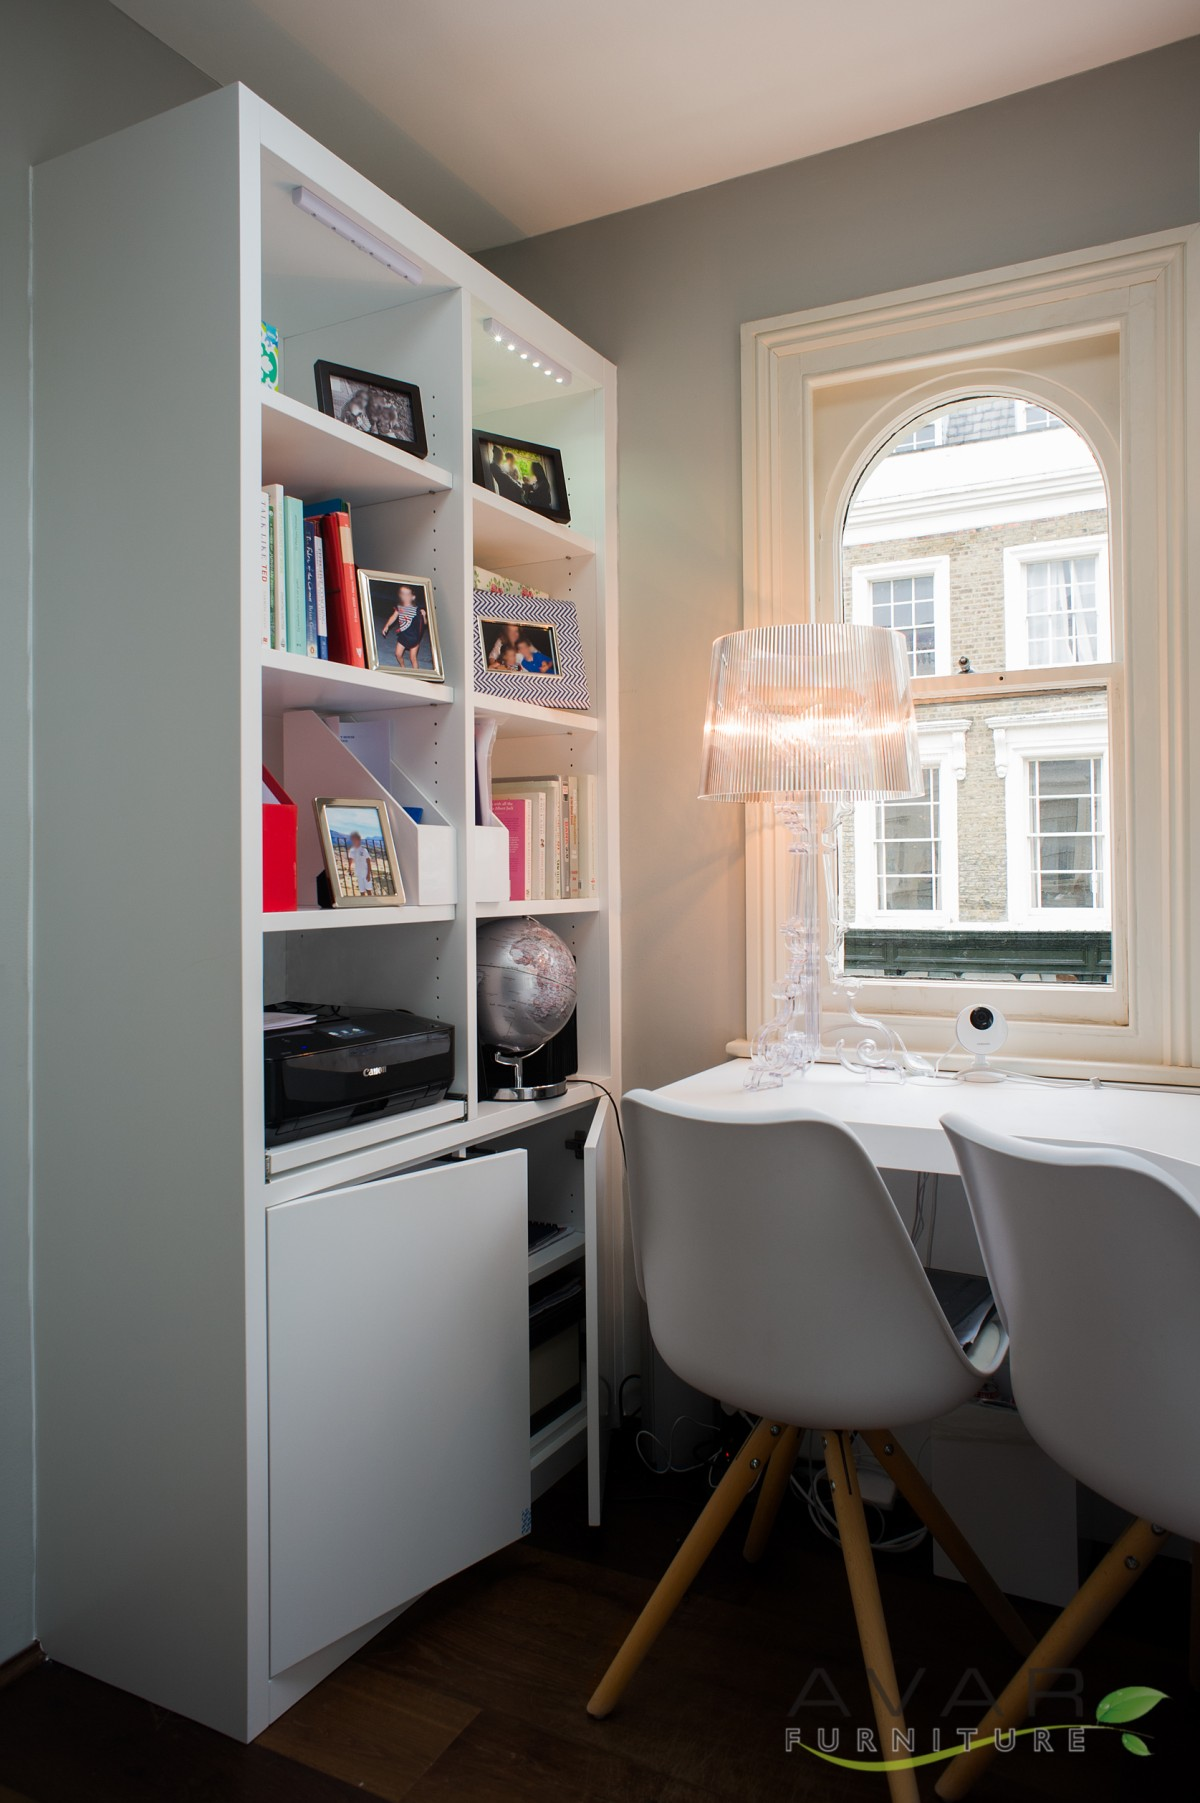 Innovative  Office Furniture Gallery 3  North London UK  Avar Furniture